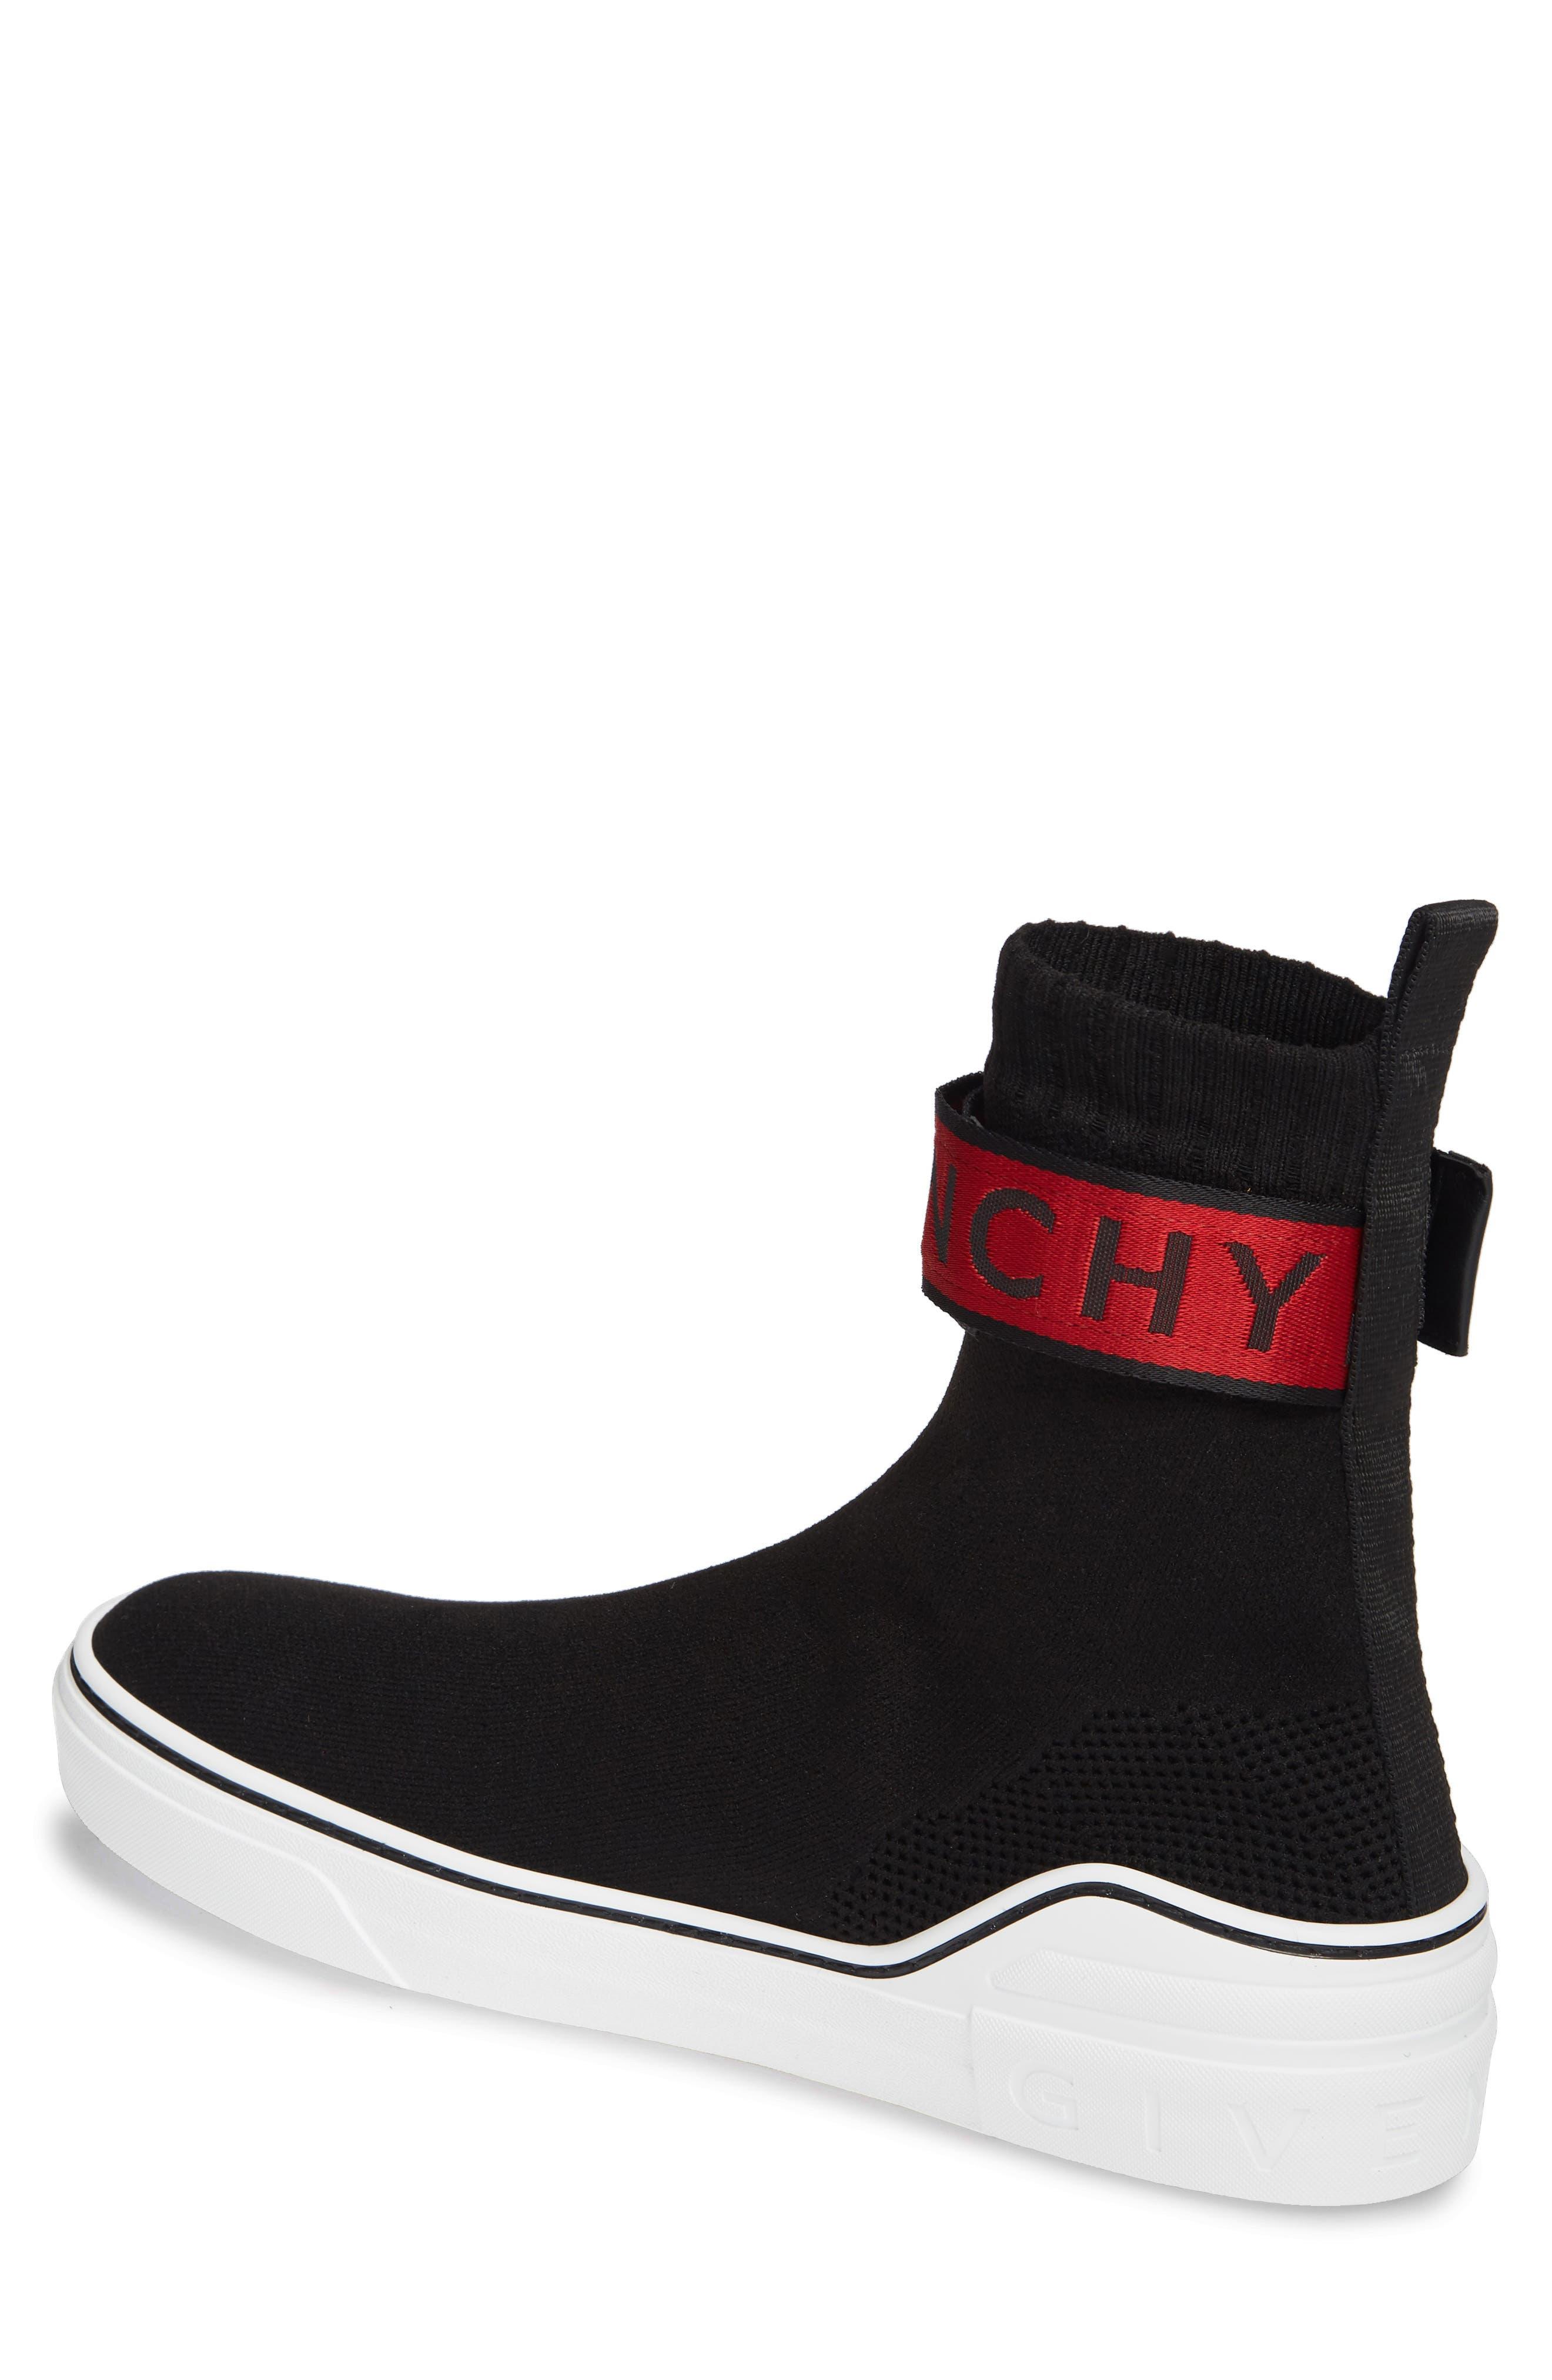 George V Sneaker,                             Alternate thumbnail 2, color,                             BLACK/ RED